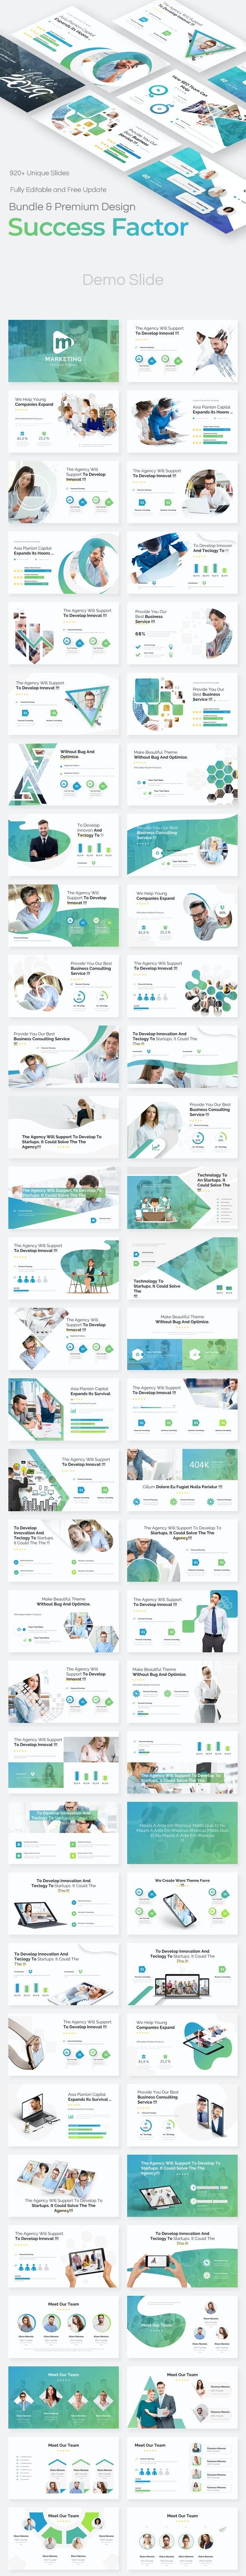 3 in 1 Success Factor Bundle Google Slide Pitch Deck Template - Google Slides Presentation Templates